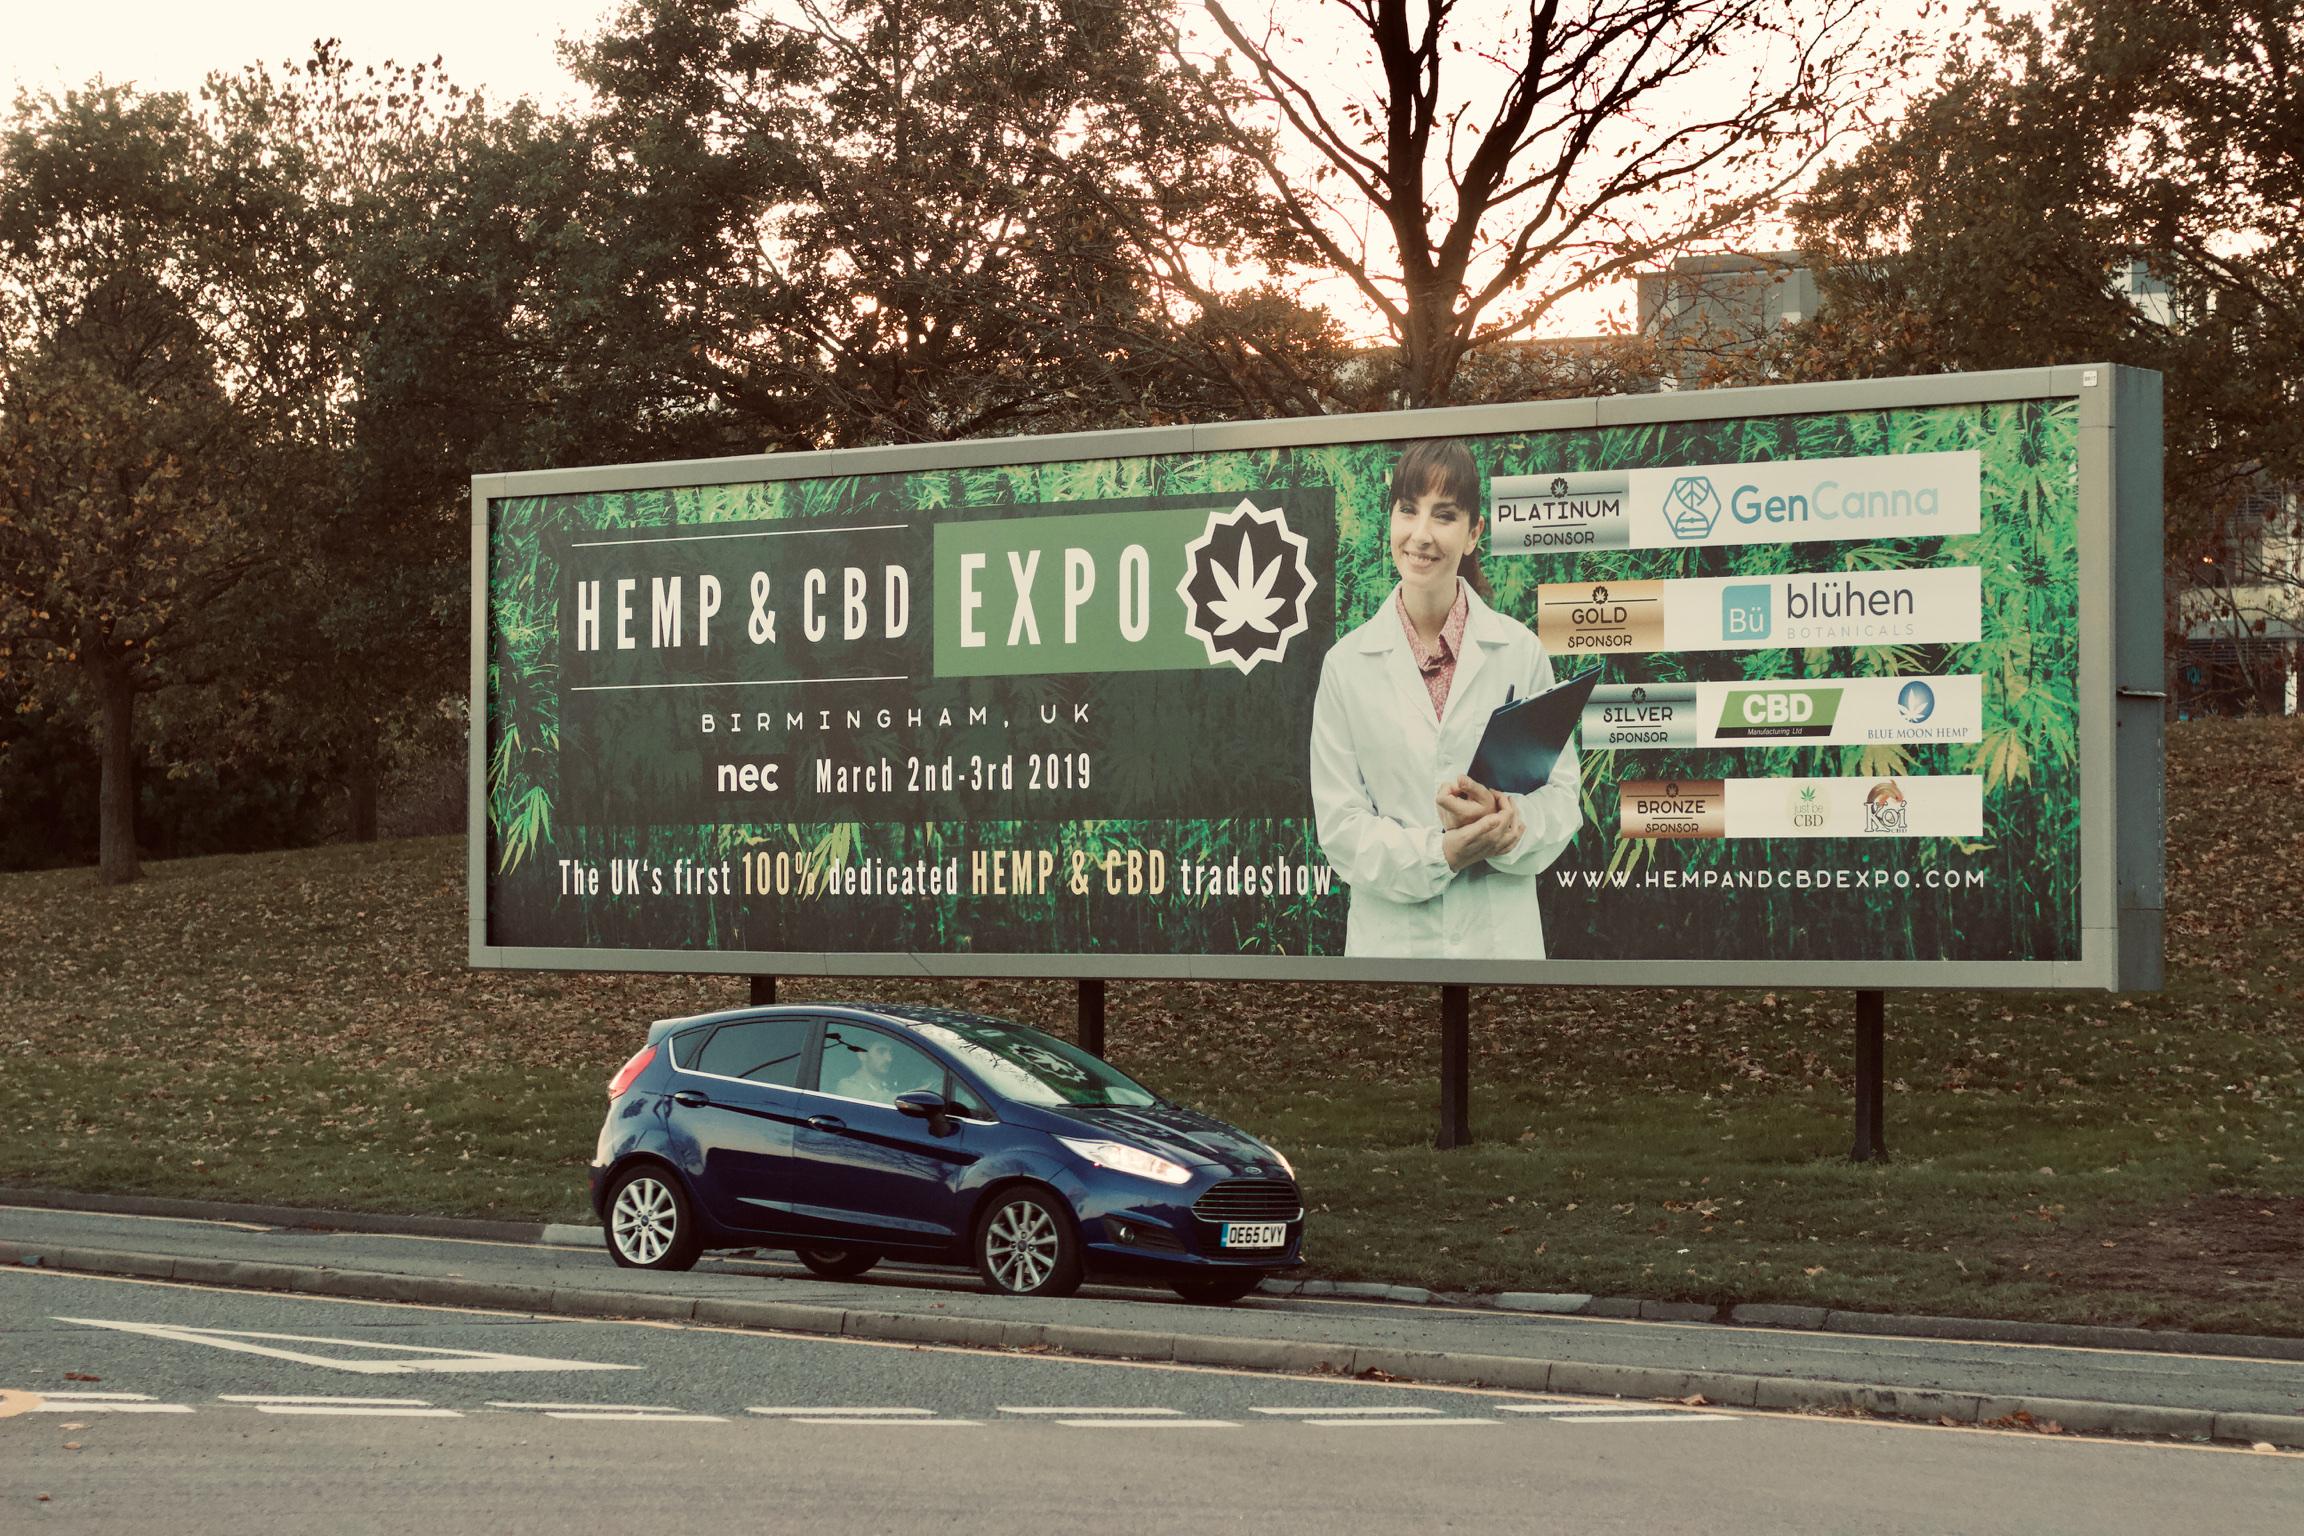 hemp and cbd expo billboard